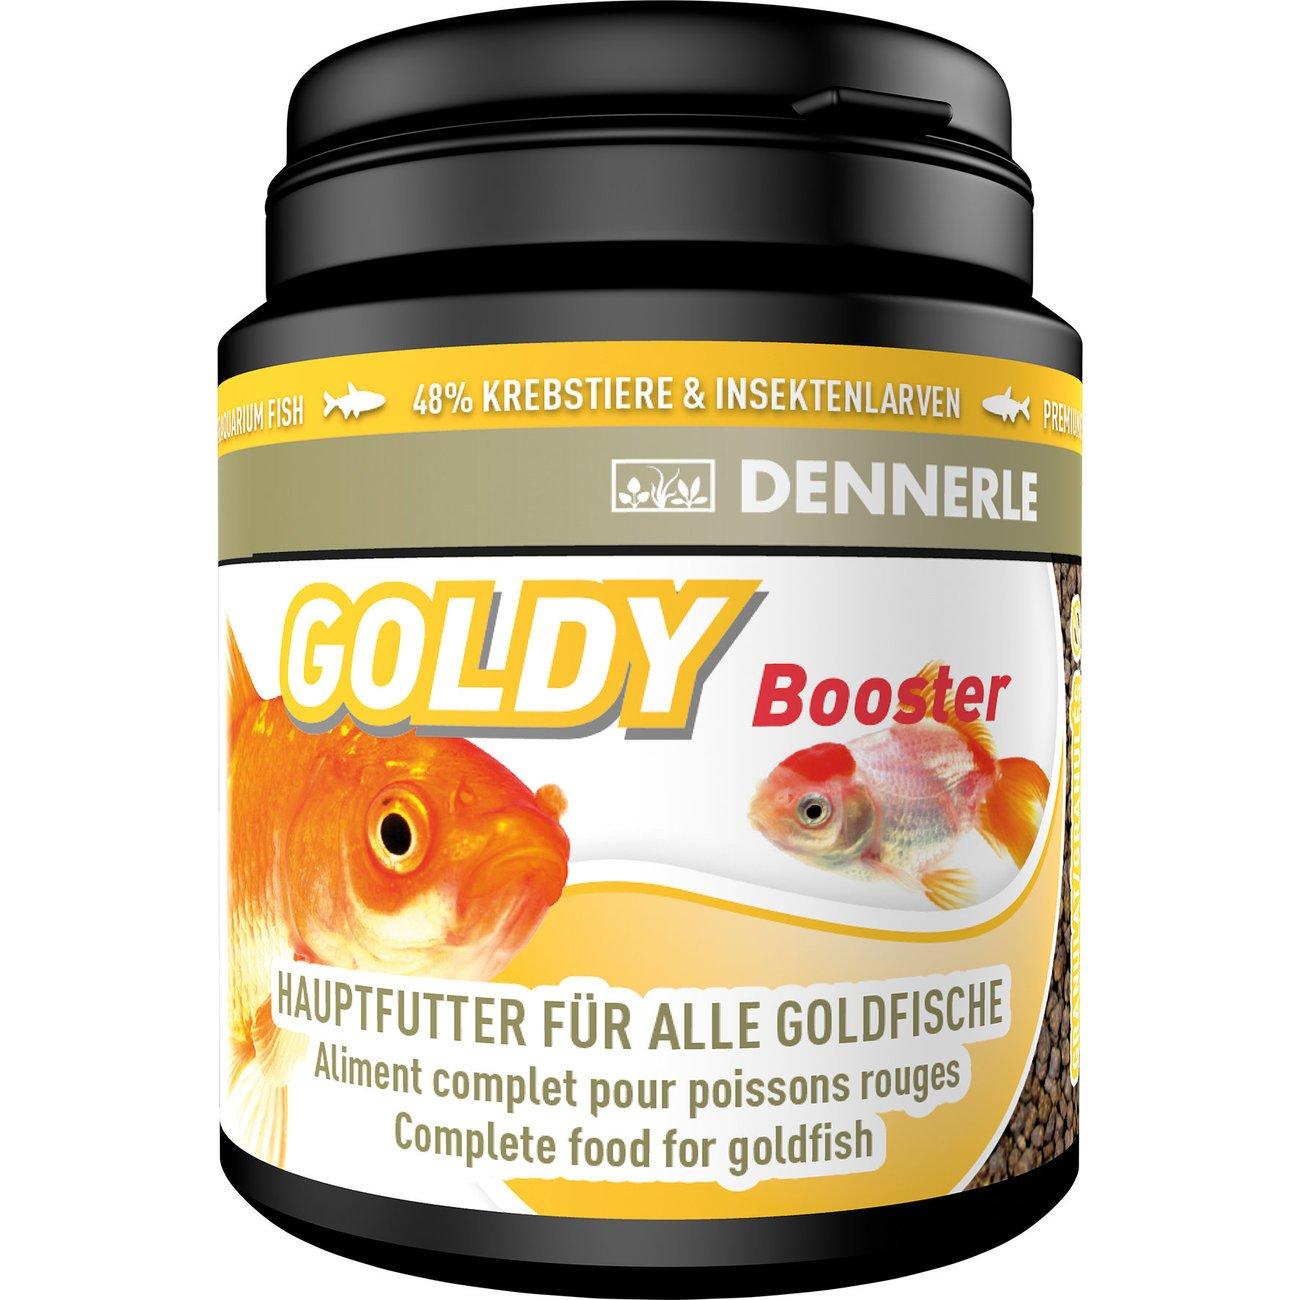 Dennerle Goldy Booster, Bild 3